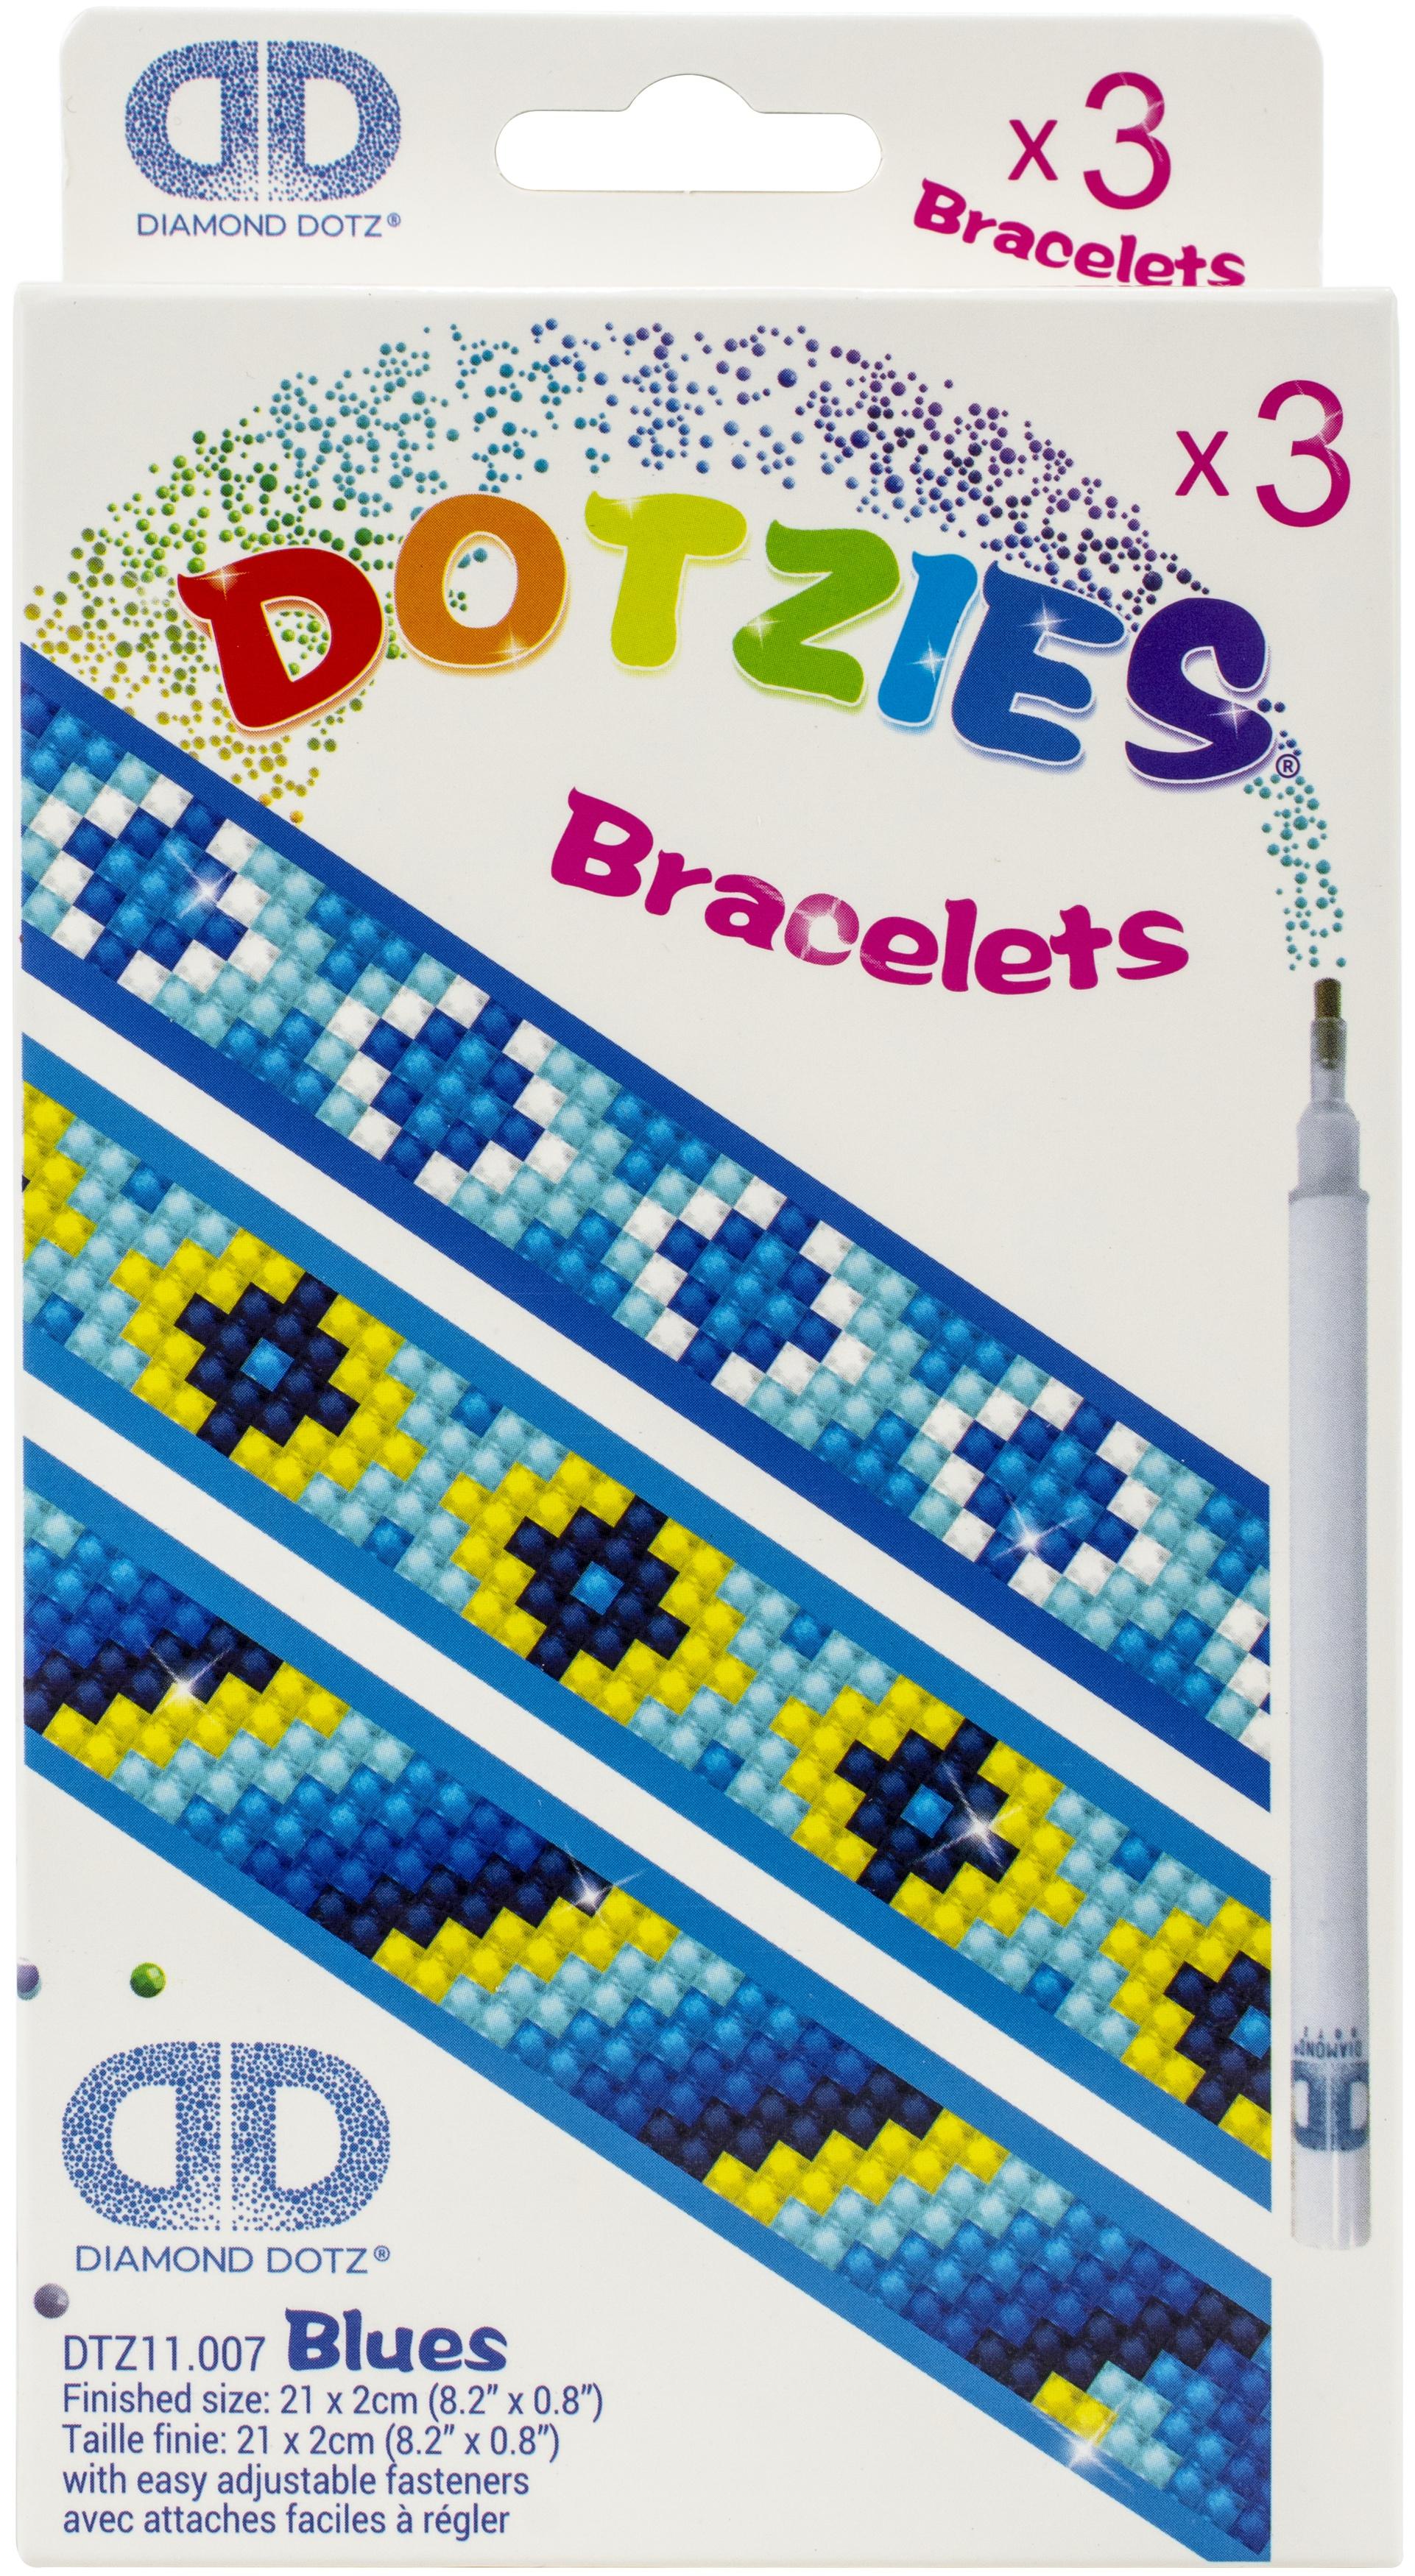 Diamond Dotz DOTZIES Bracelets Facet Art Kit 1X9-Assorted Blues 3/Pkg